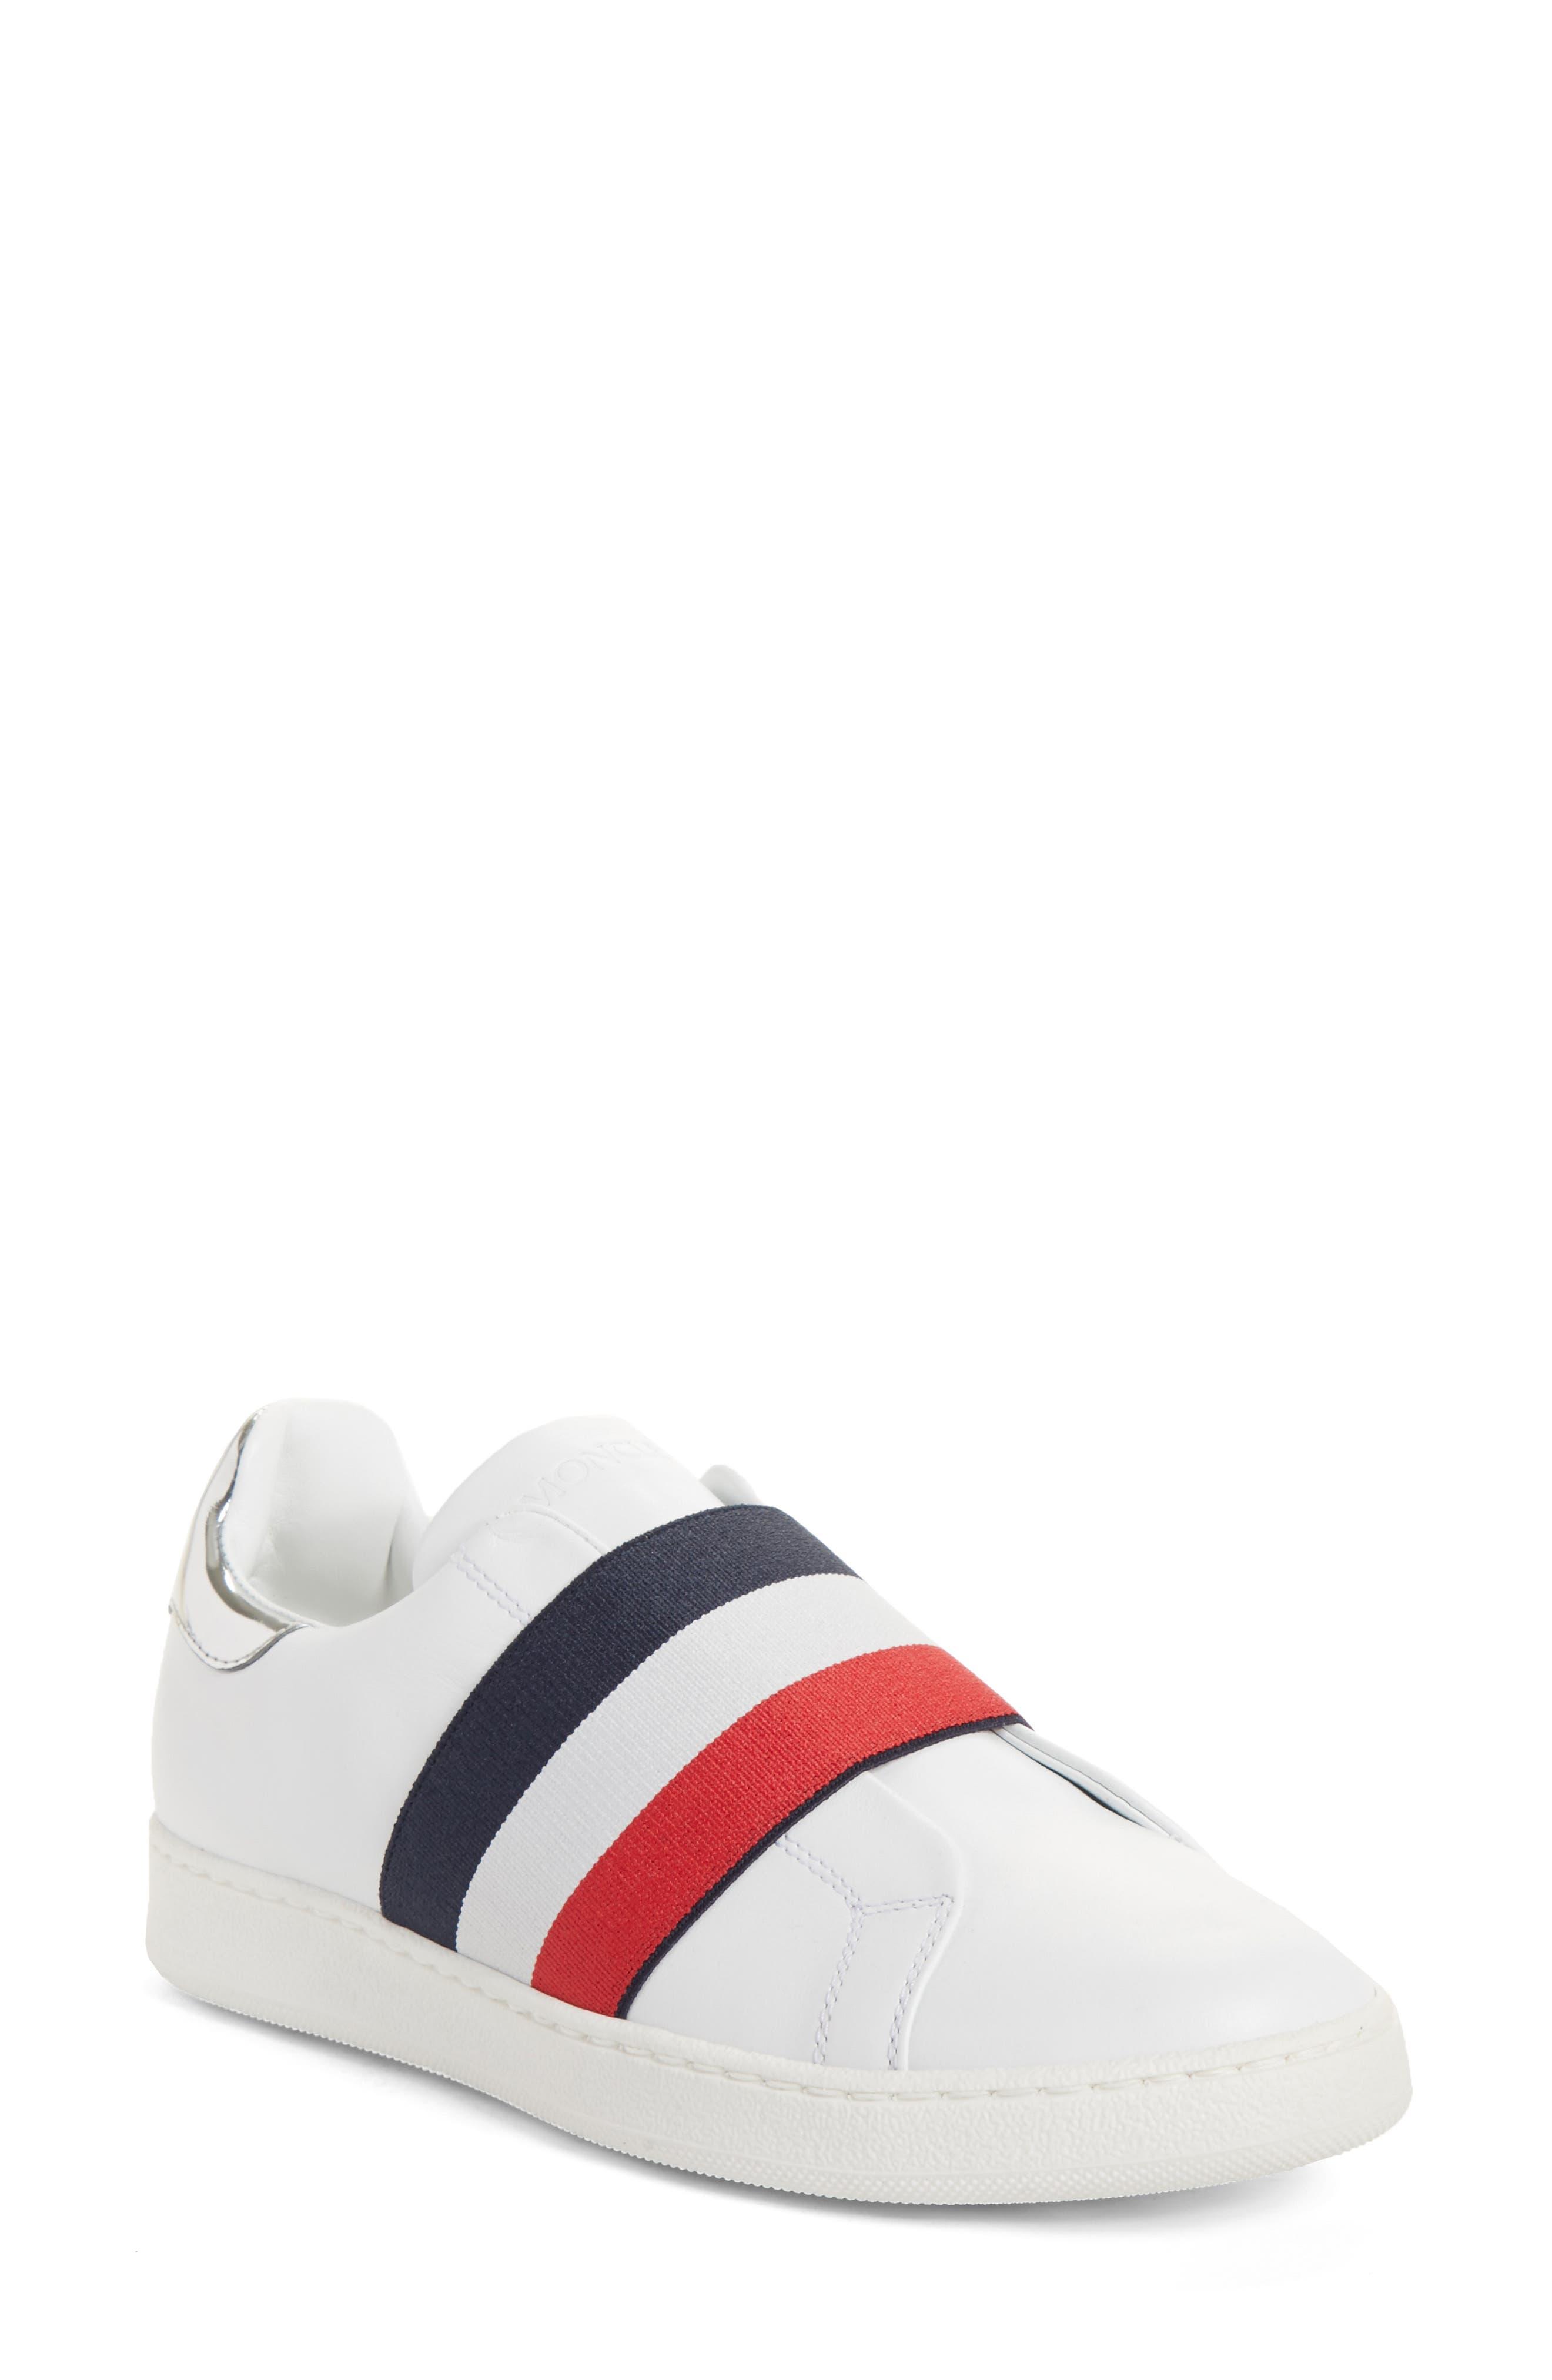 Alizee Low Top Sneaker,                         Main,                         color, 100